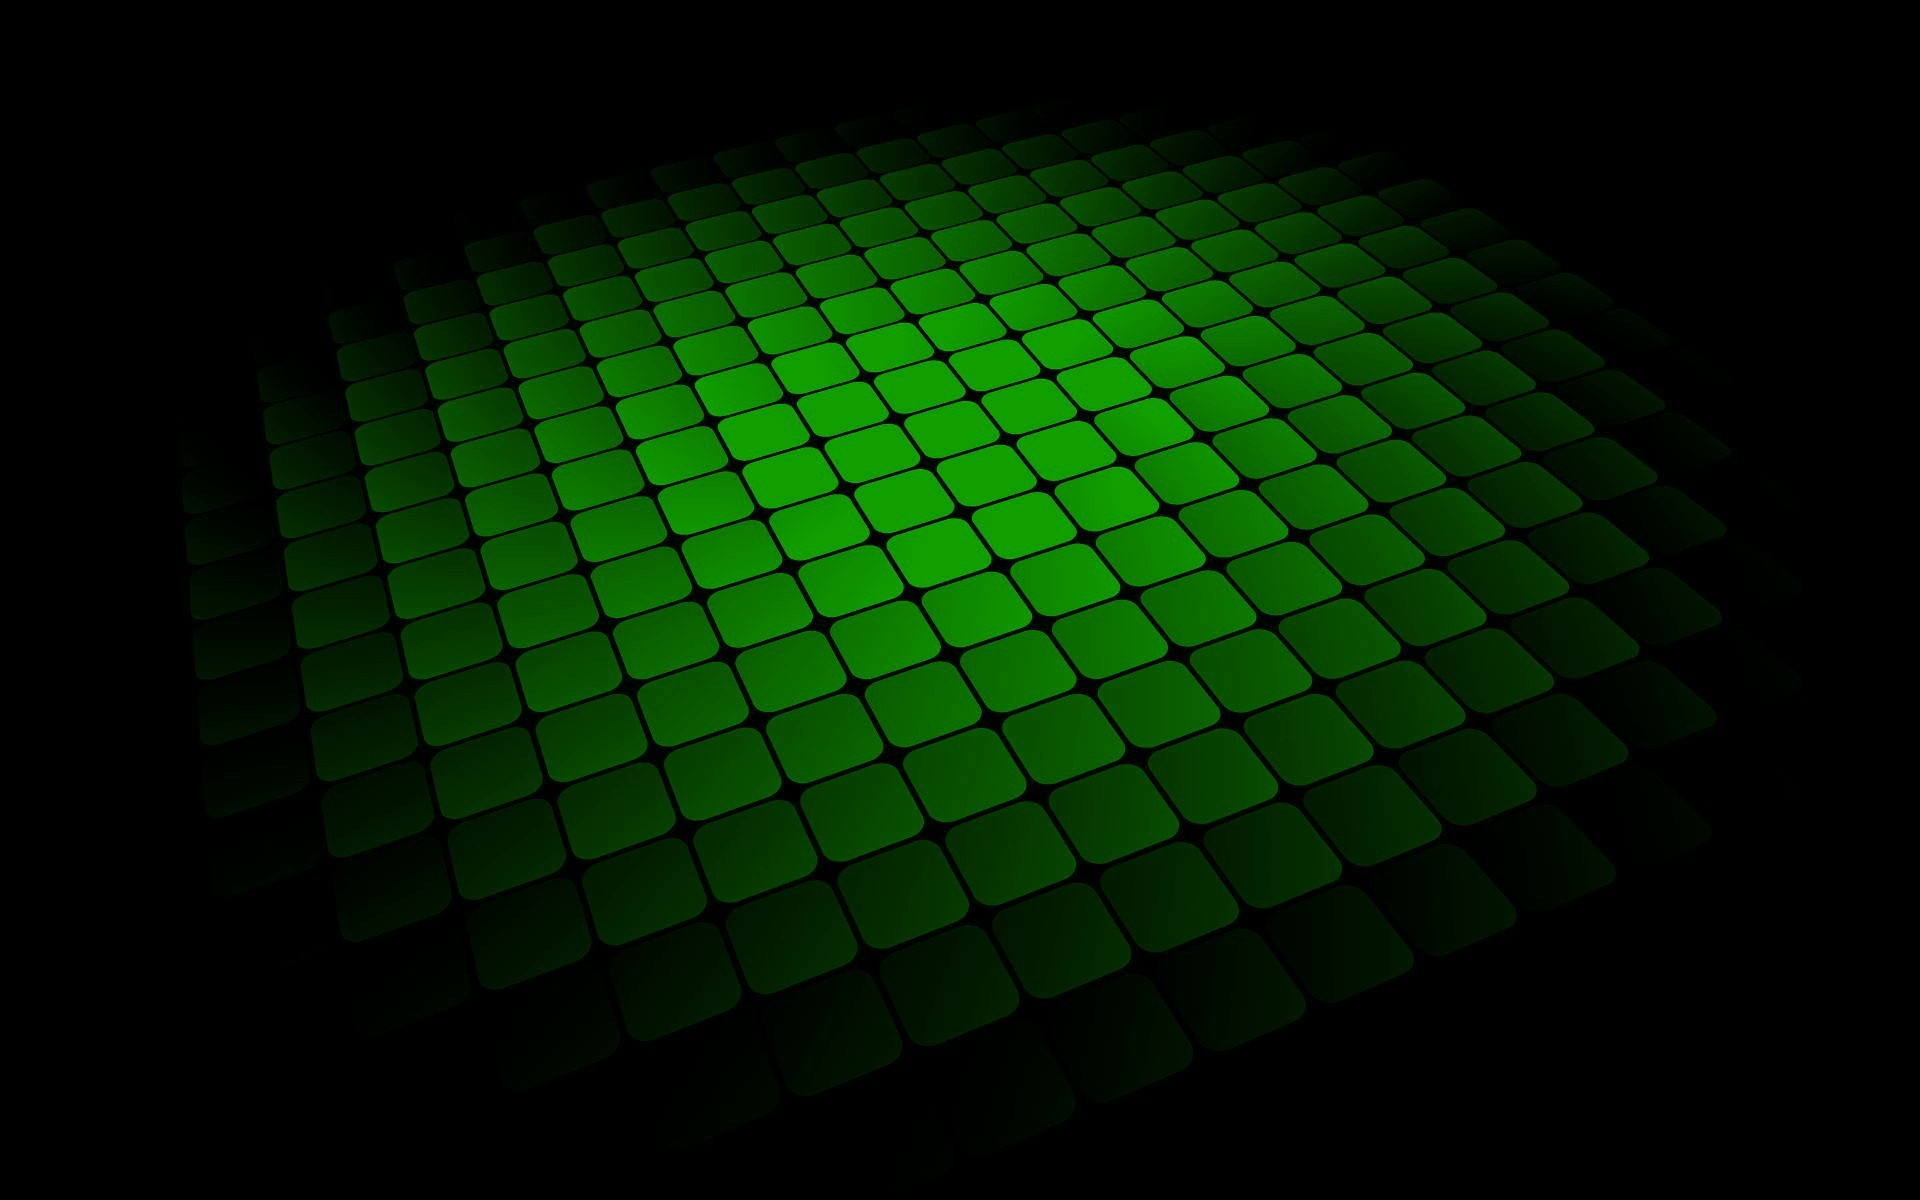 Green And Black Abstract Wallpaper  37 Widescreen Wallpaper